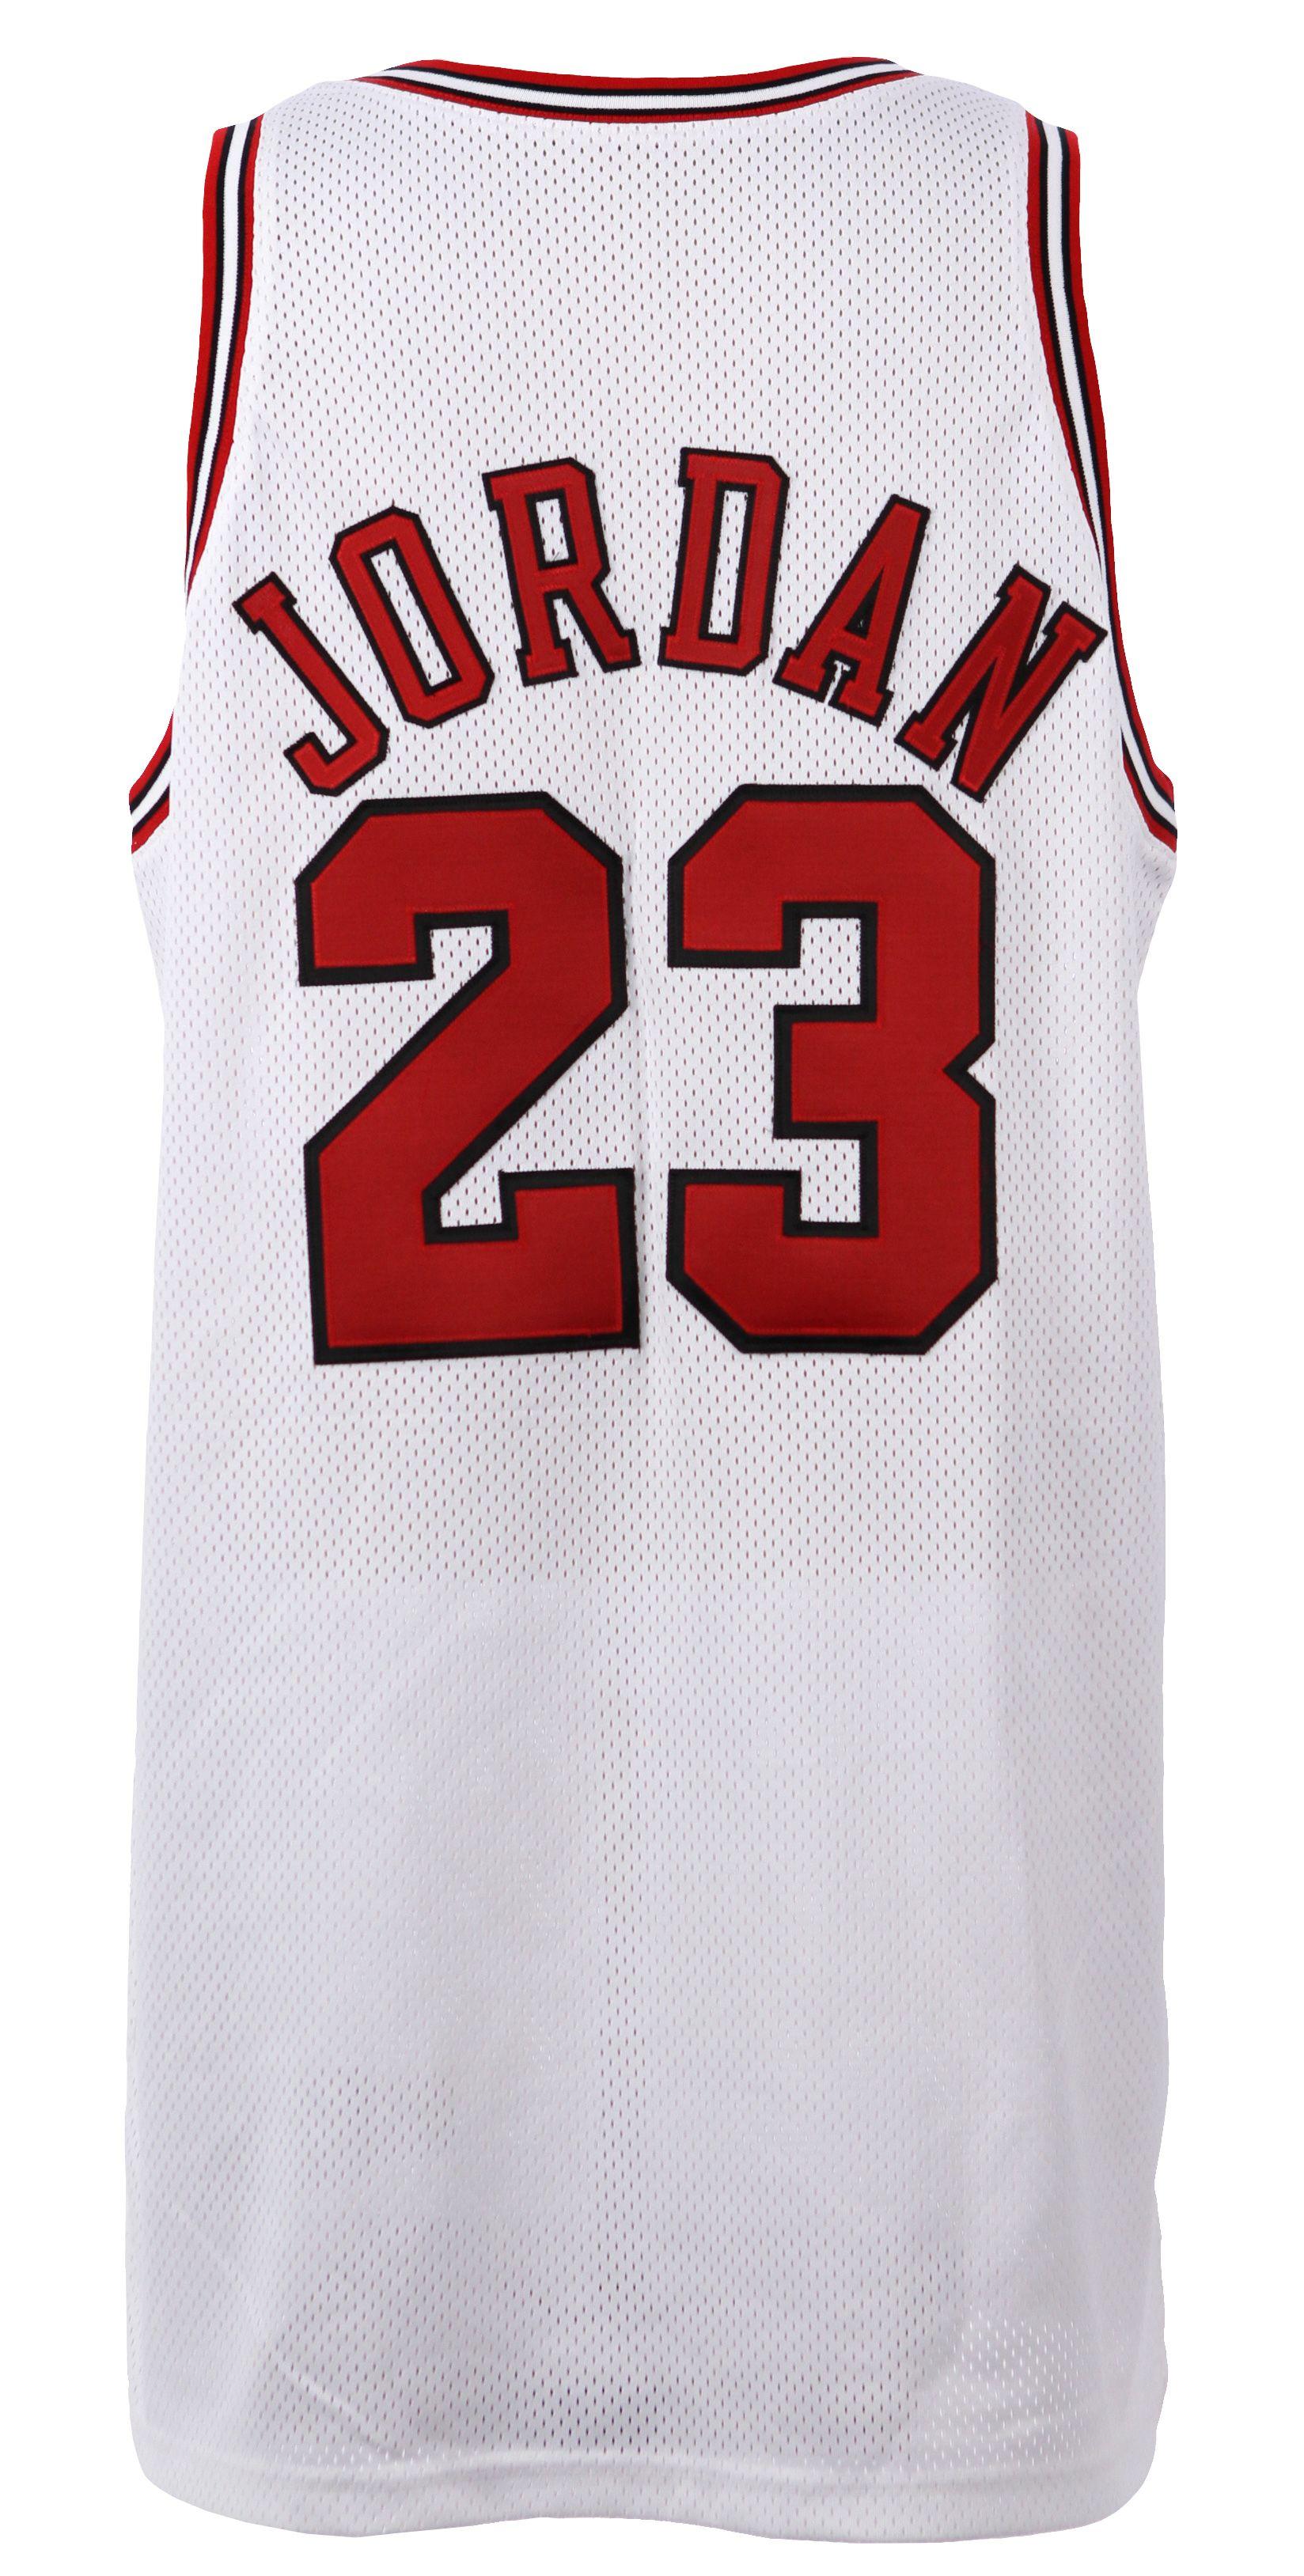 huge discount 47620 44ca5 Champion Chicago Bulls jersey 23 Michael Jordan white NBA ...